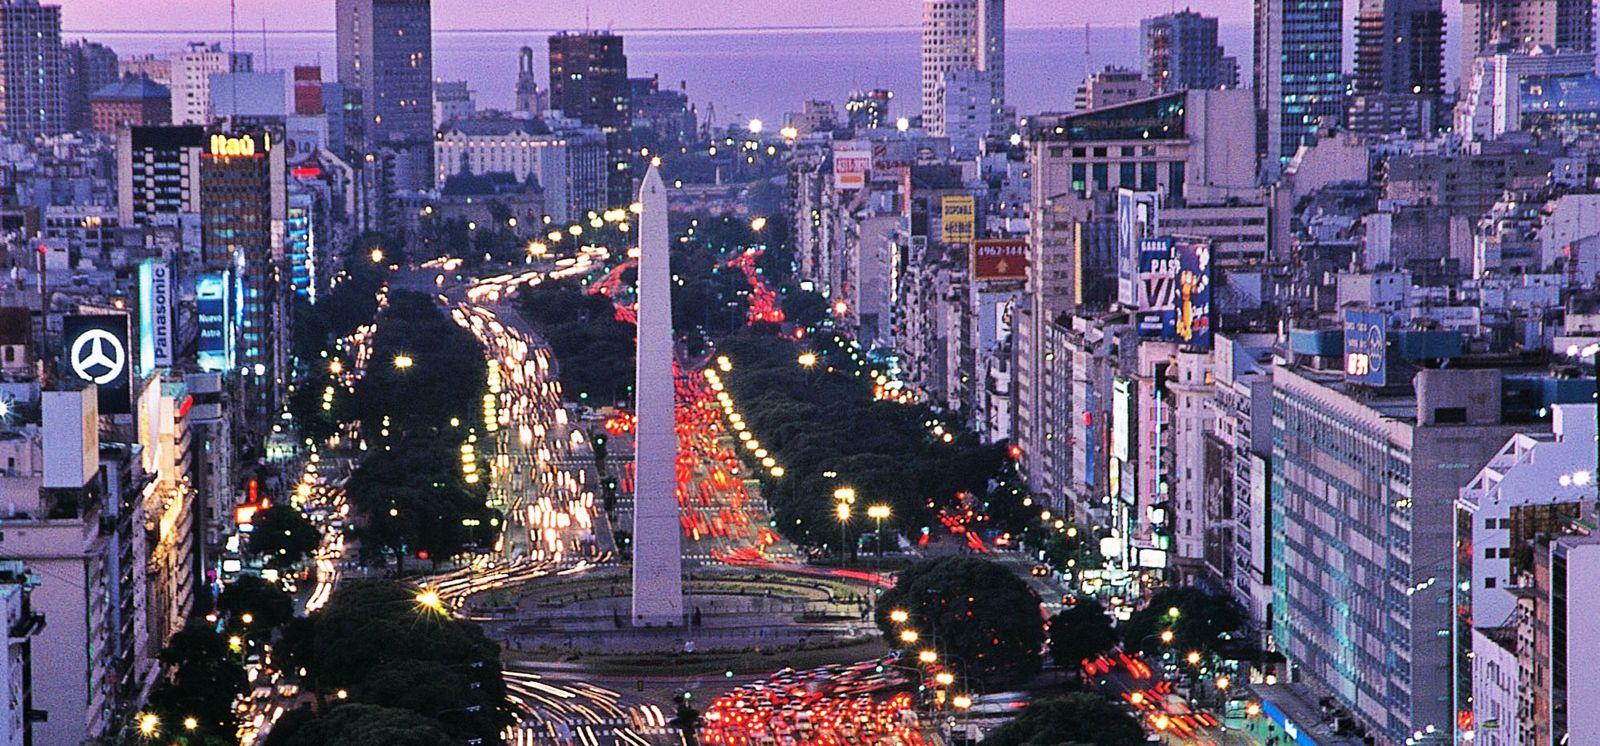 O Obelisco de Buenos Aires hoje